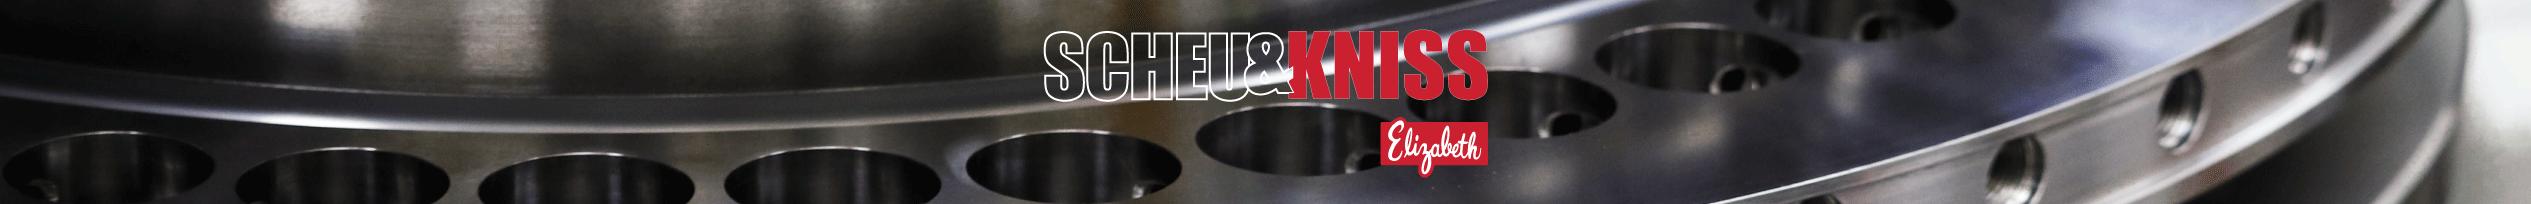 Elizabeth Scheu & Kniss